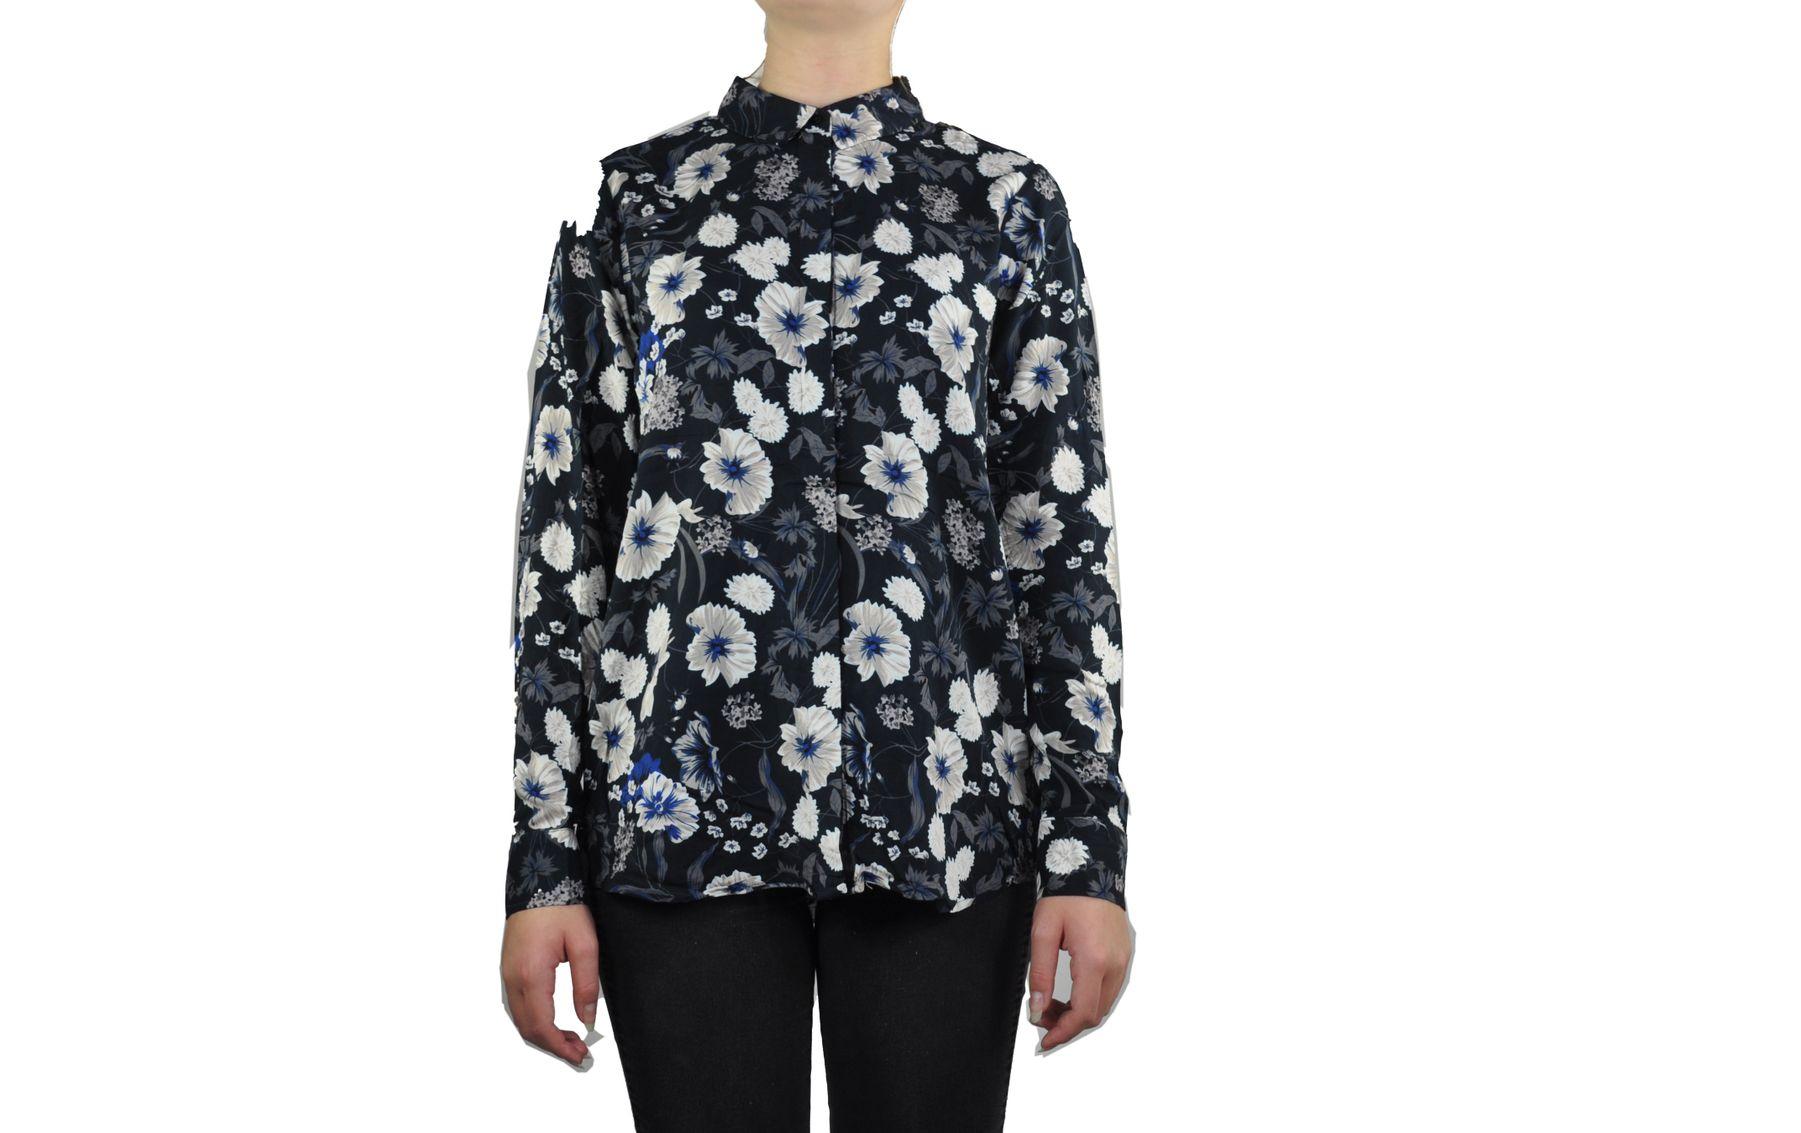 Soyaconcept - Damen Bluse mit Flower Muster, SC-Pammy 2 (14622-30) – Bild 1